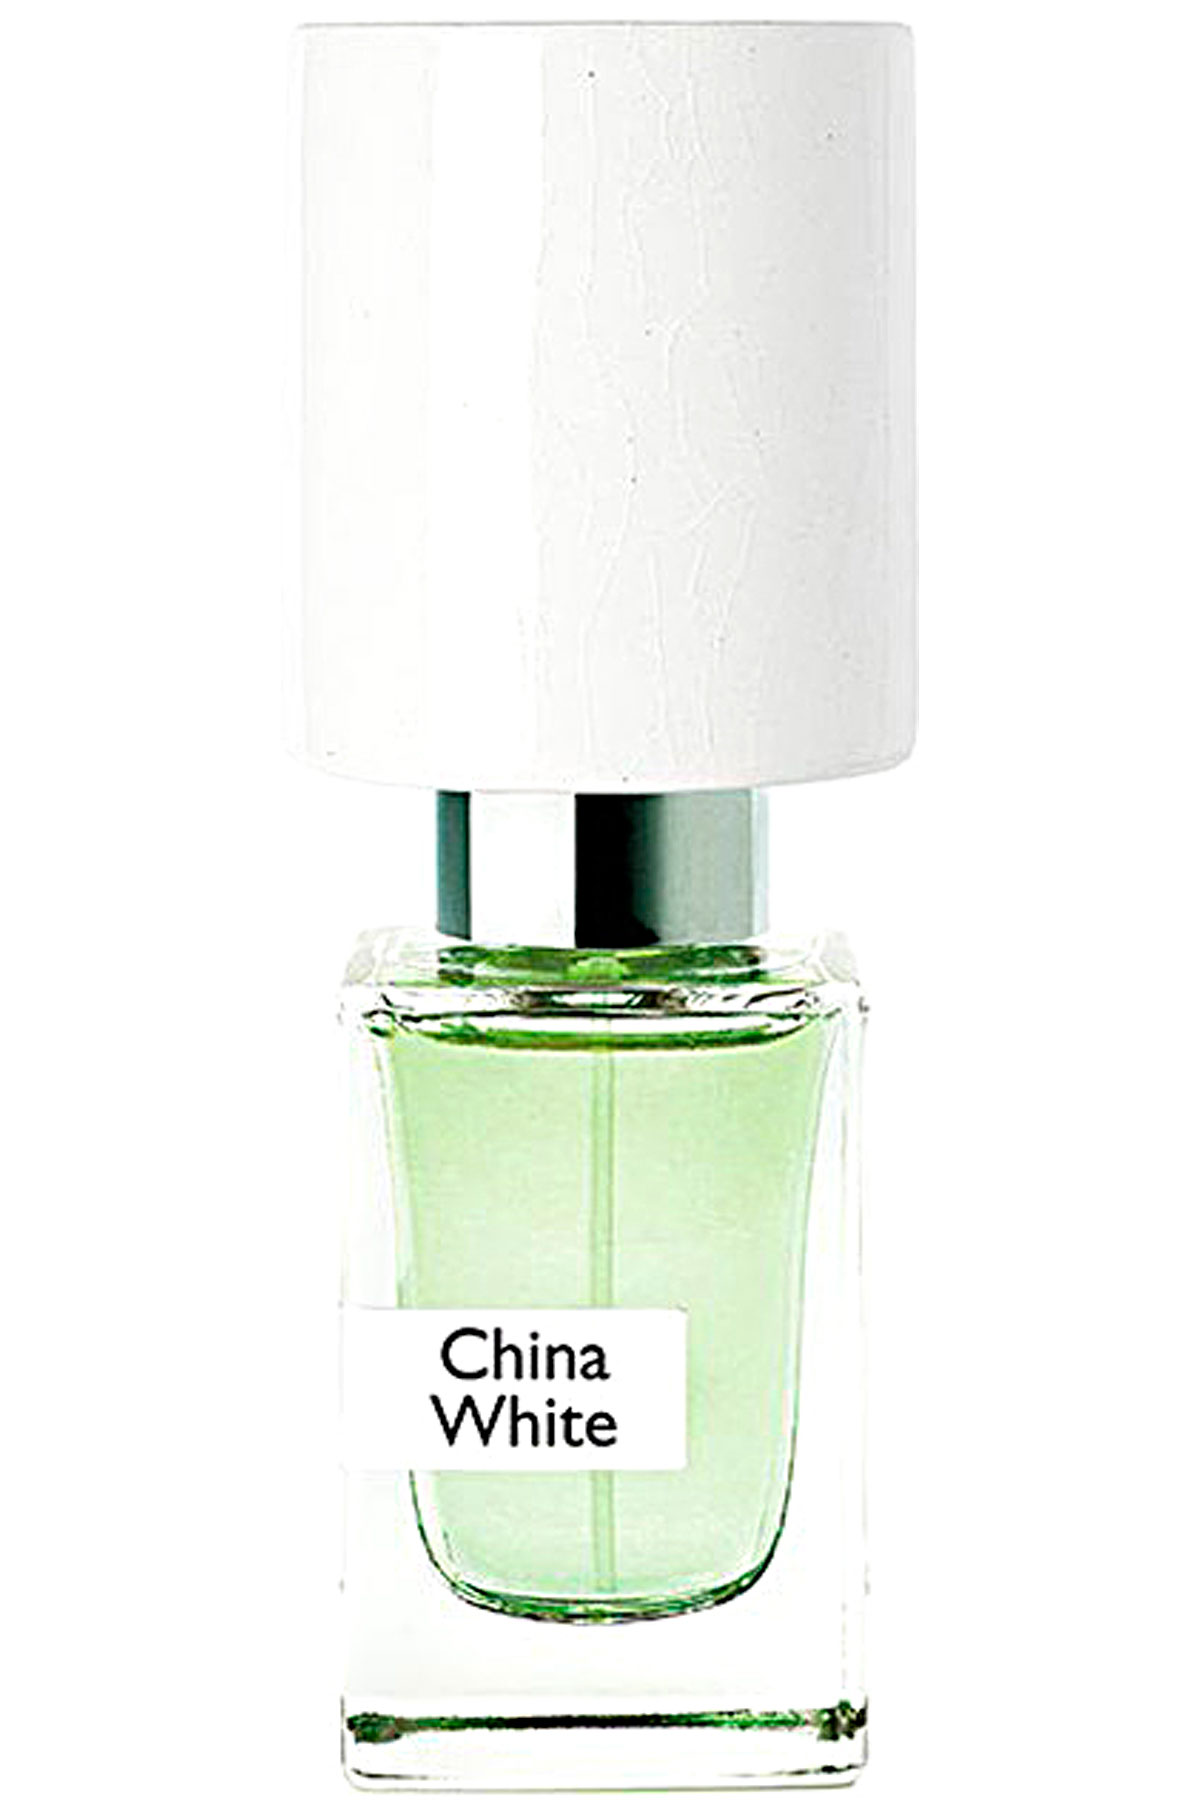 Nasomatto Fragrances for Women, China White - Extrait De Parfum - 30 Ml, 2019, 30 ml